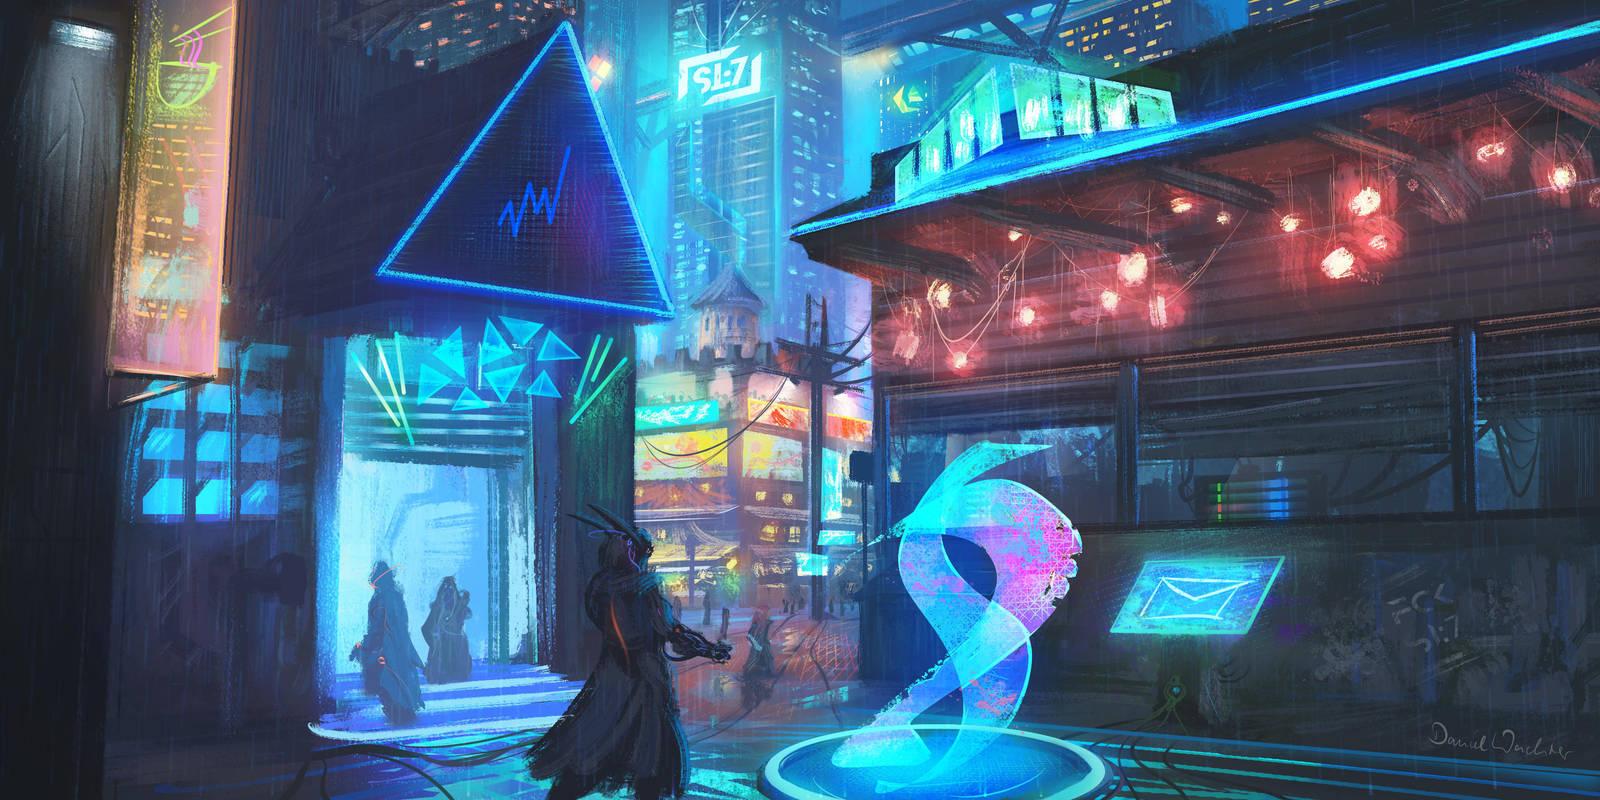 Cyberpunk-Stormwind by danielwachter